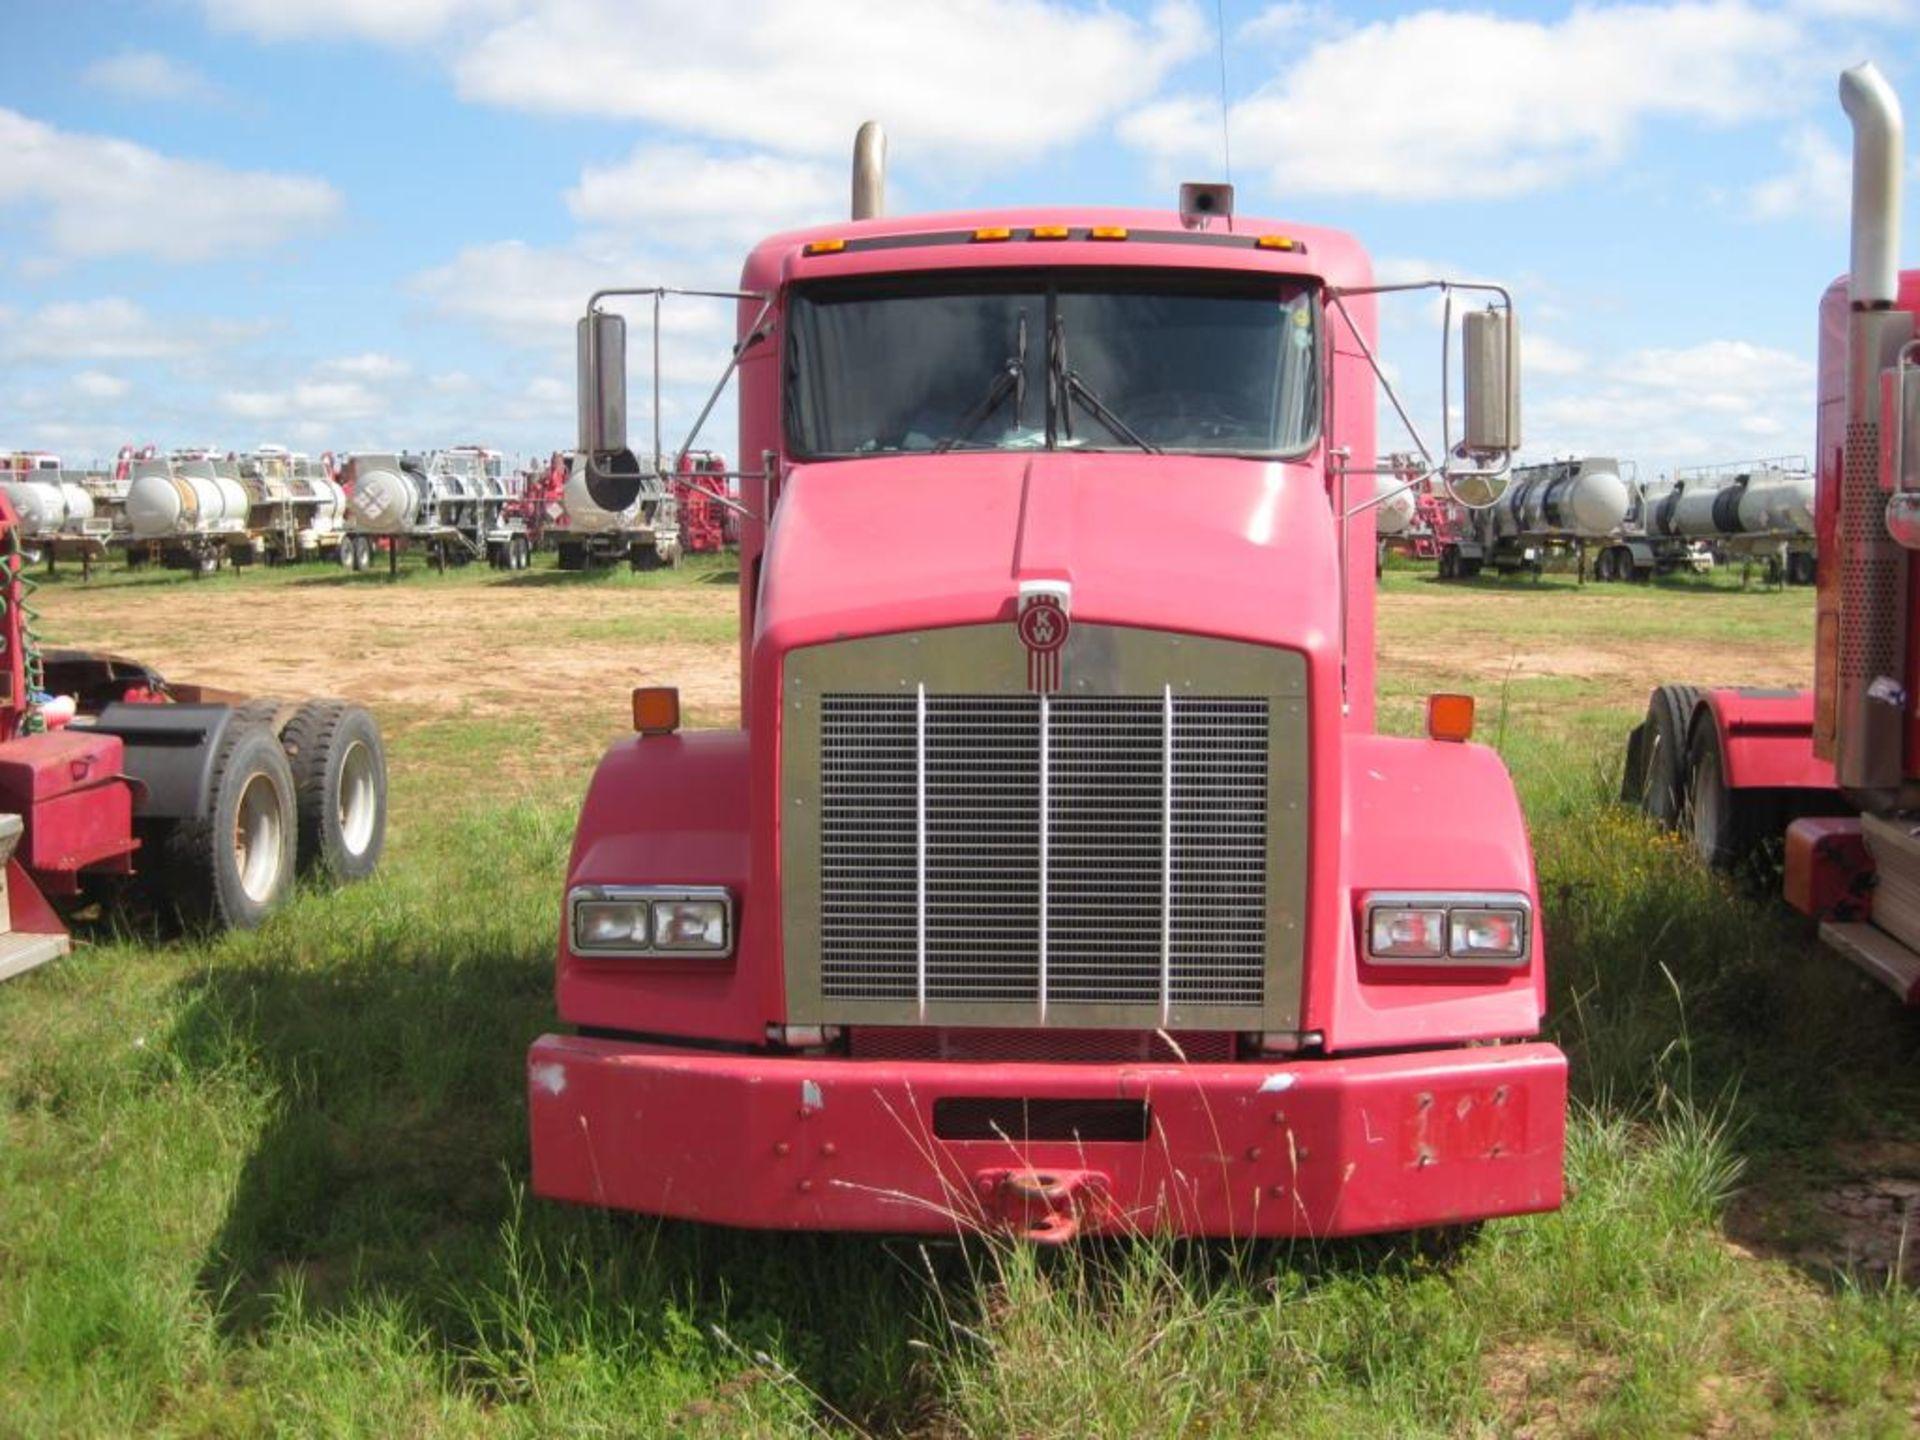 Kenworth Truck - Image 3 of 20